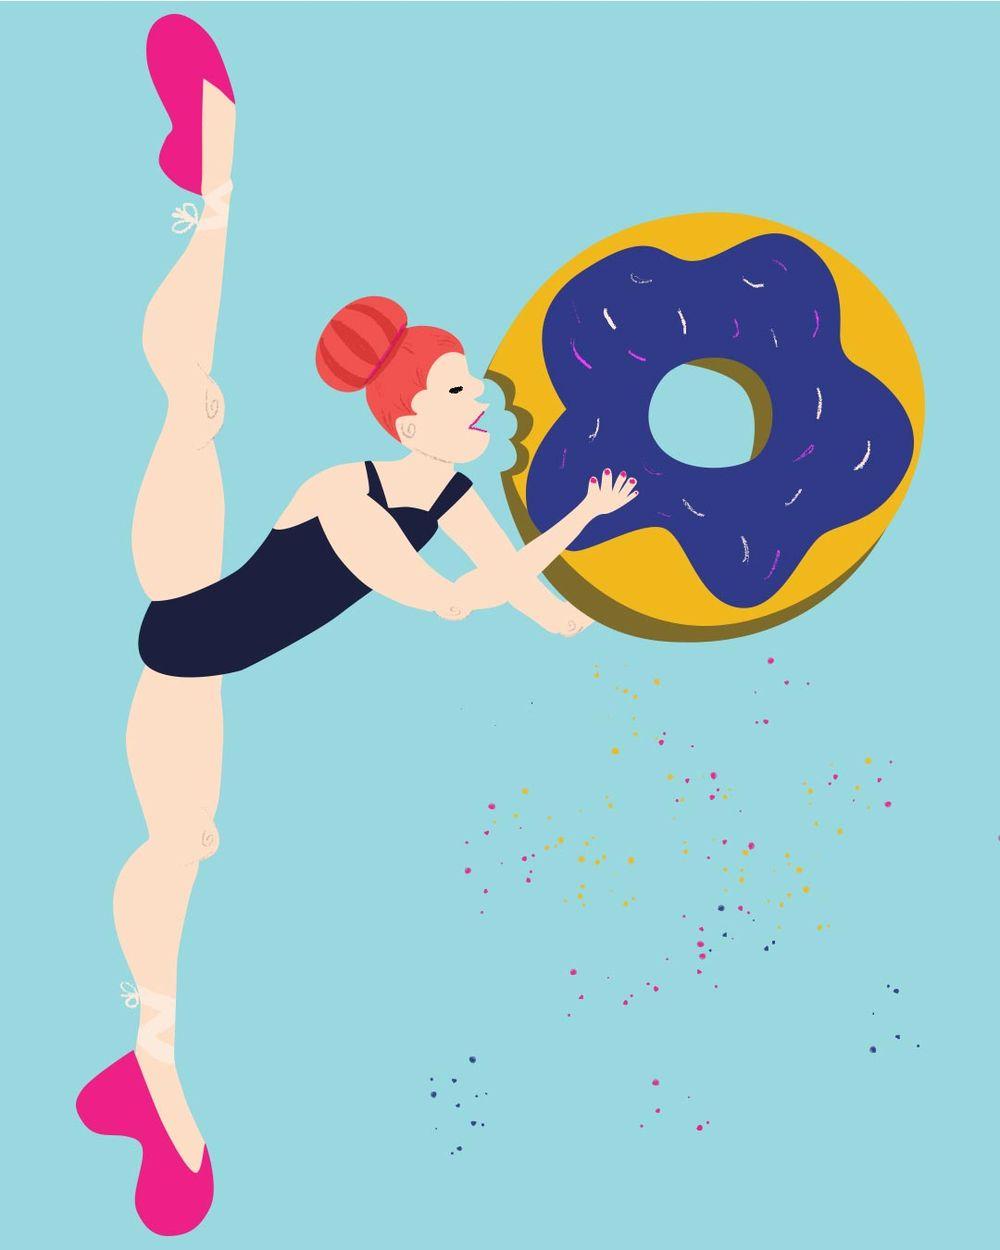 OddBody Ballerina - image 1 - student project